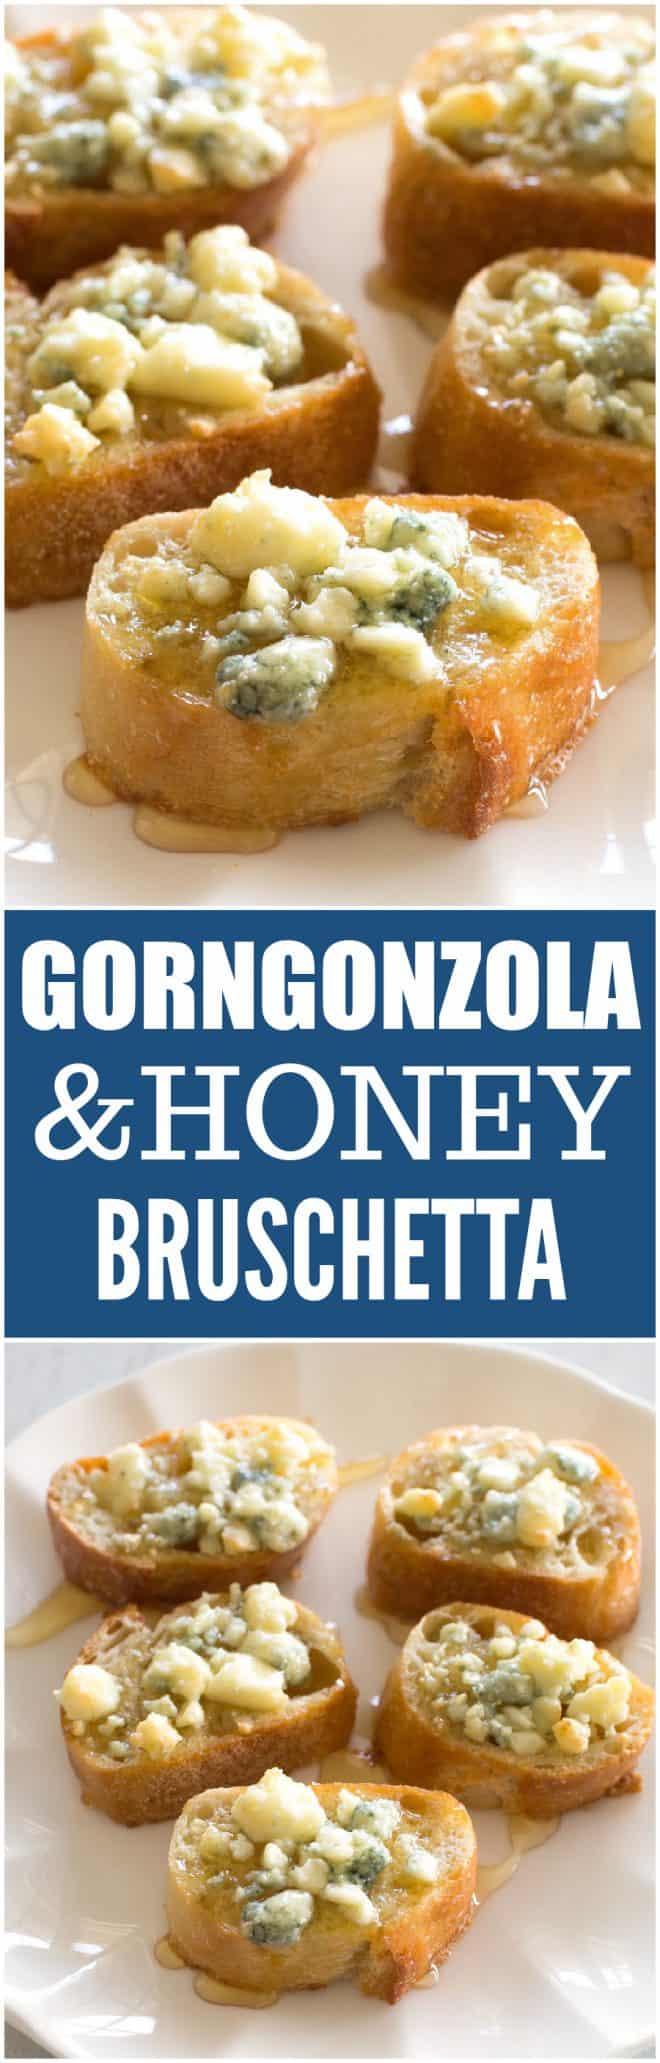 gorgonzola and honey on bread